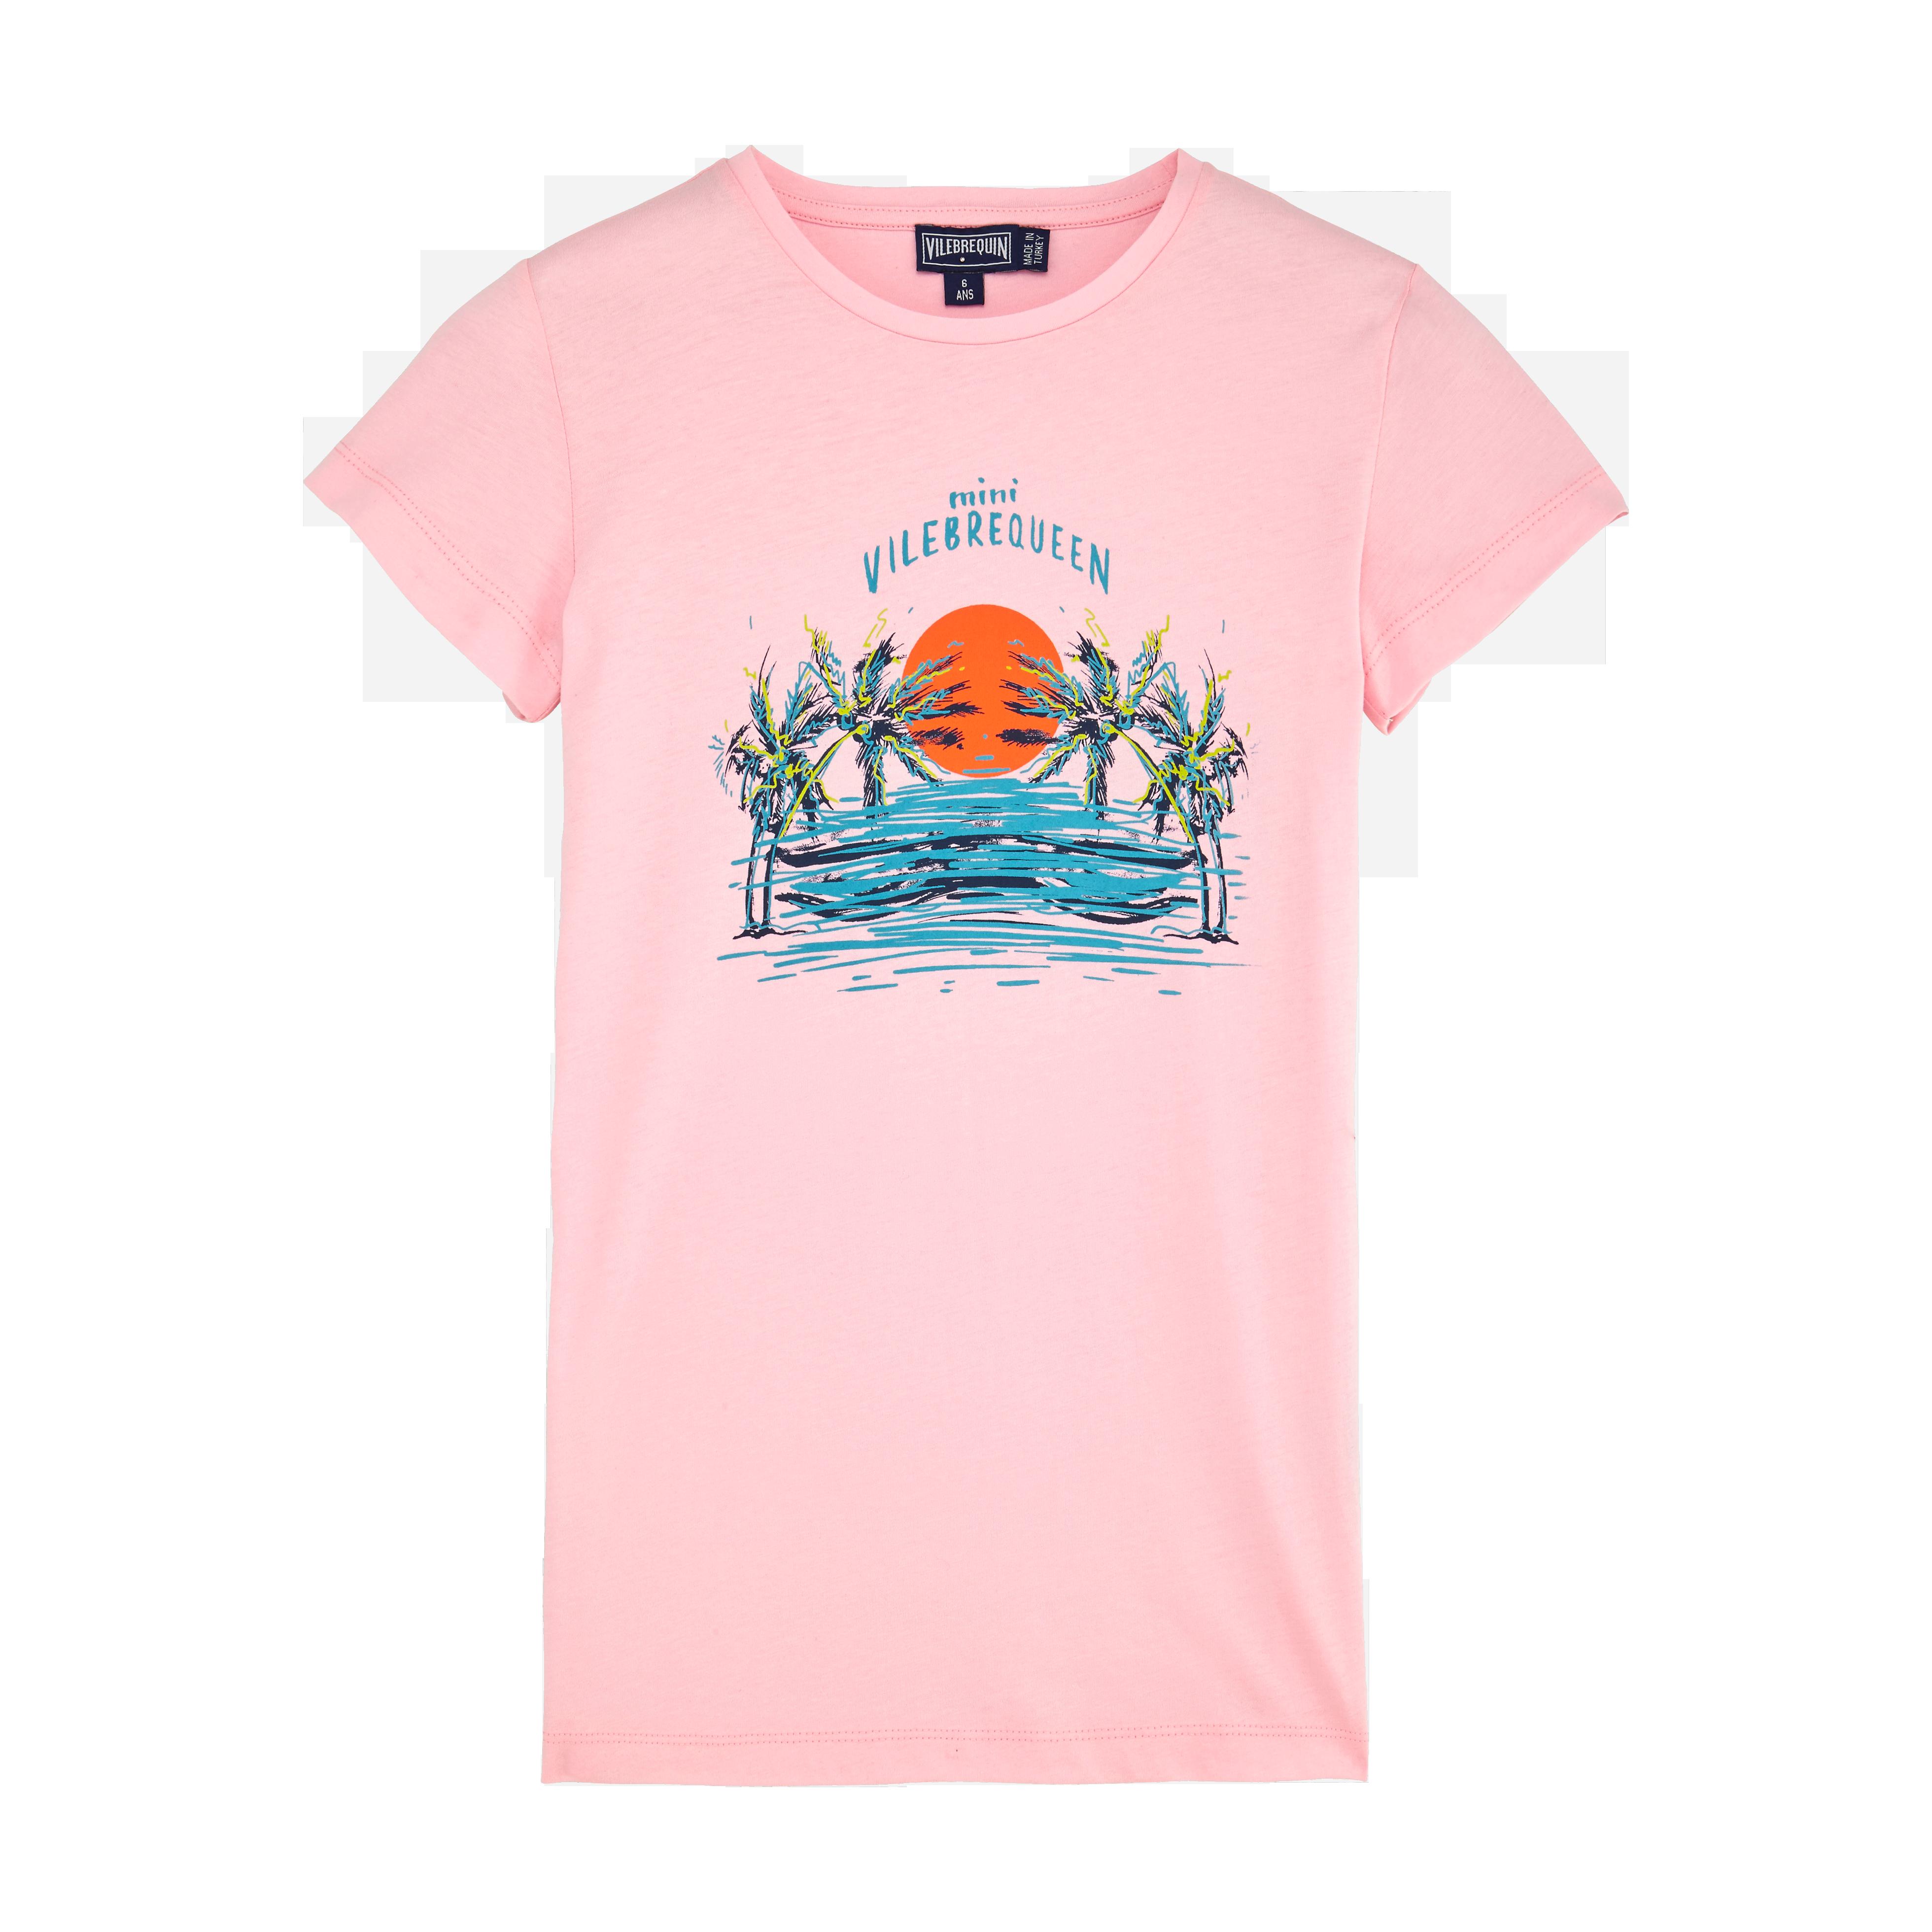 VILEBREQUIN | PAP UNISEXE ENFANT - Girls Cotton T-shirt Dress Mini Vilebrequeen - TEE SHIRT - GALIPET - Pink - 14 - Vilebrequin | Goxip